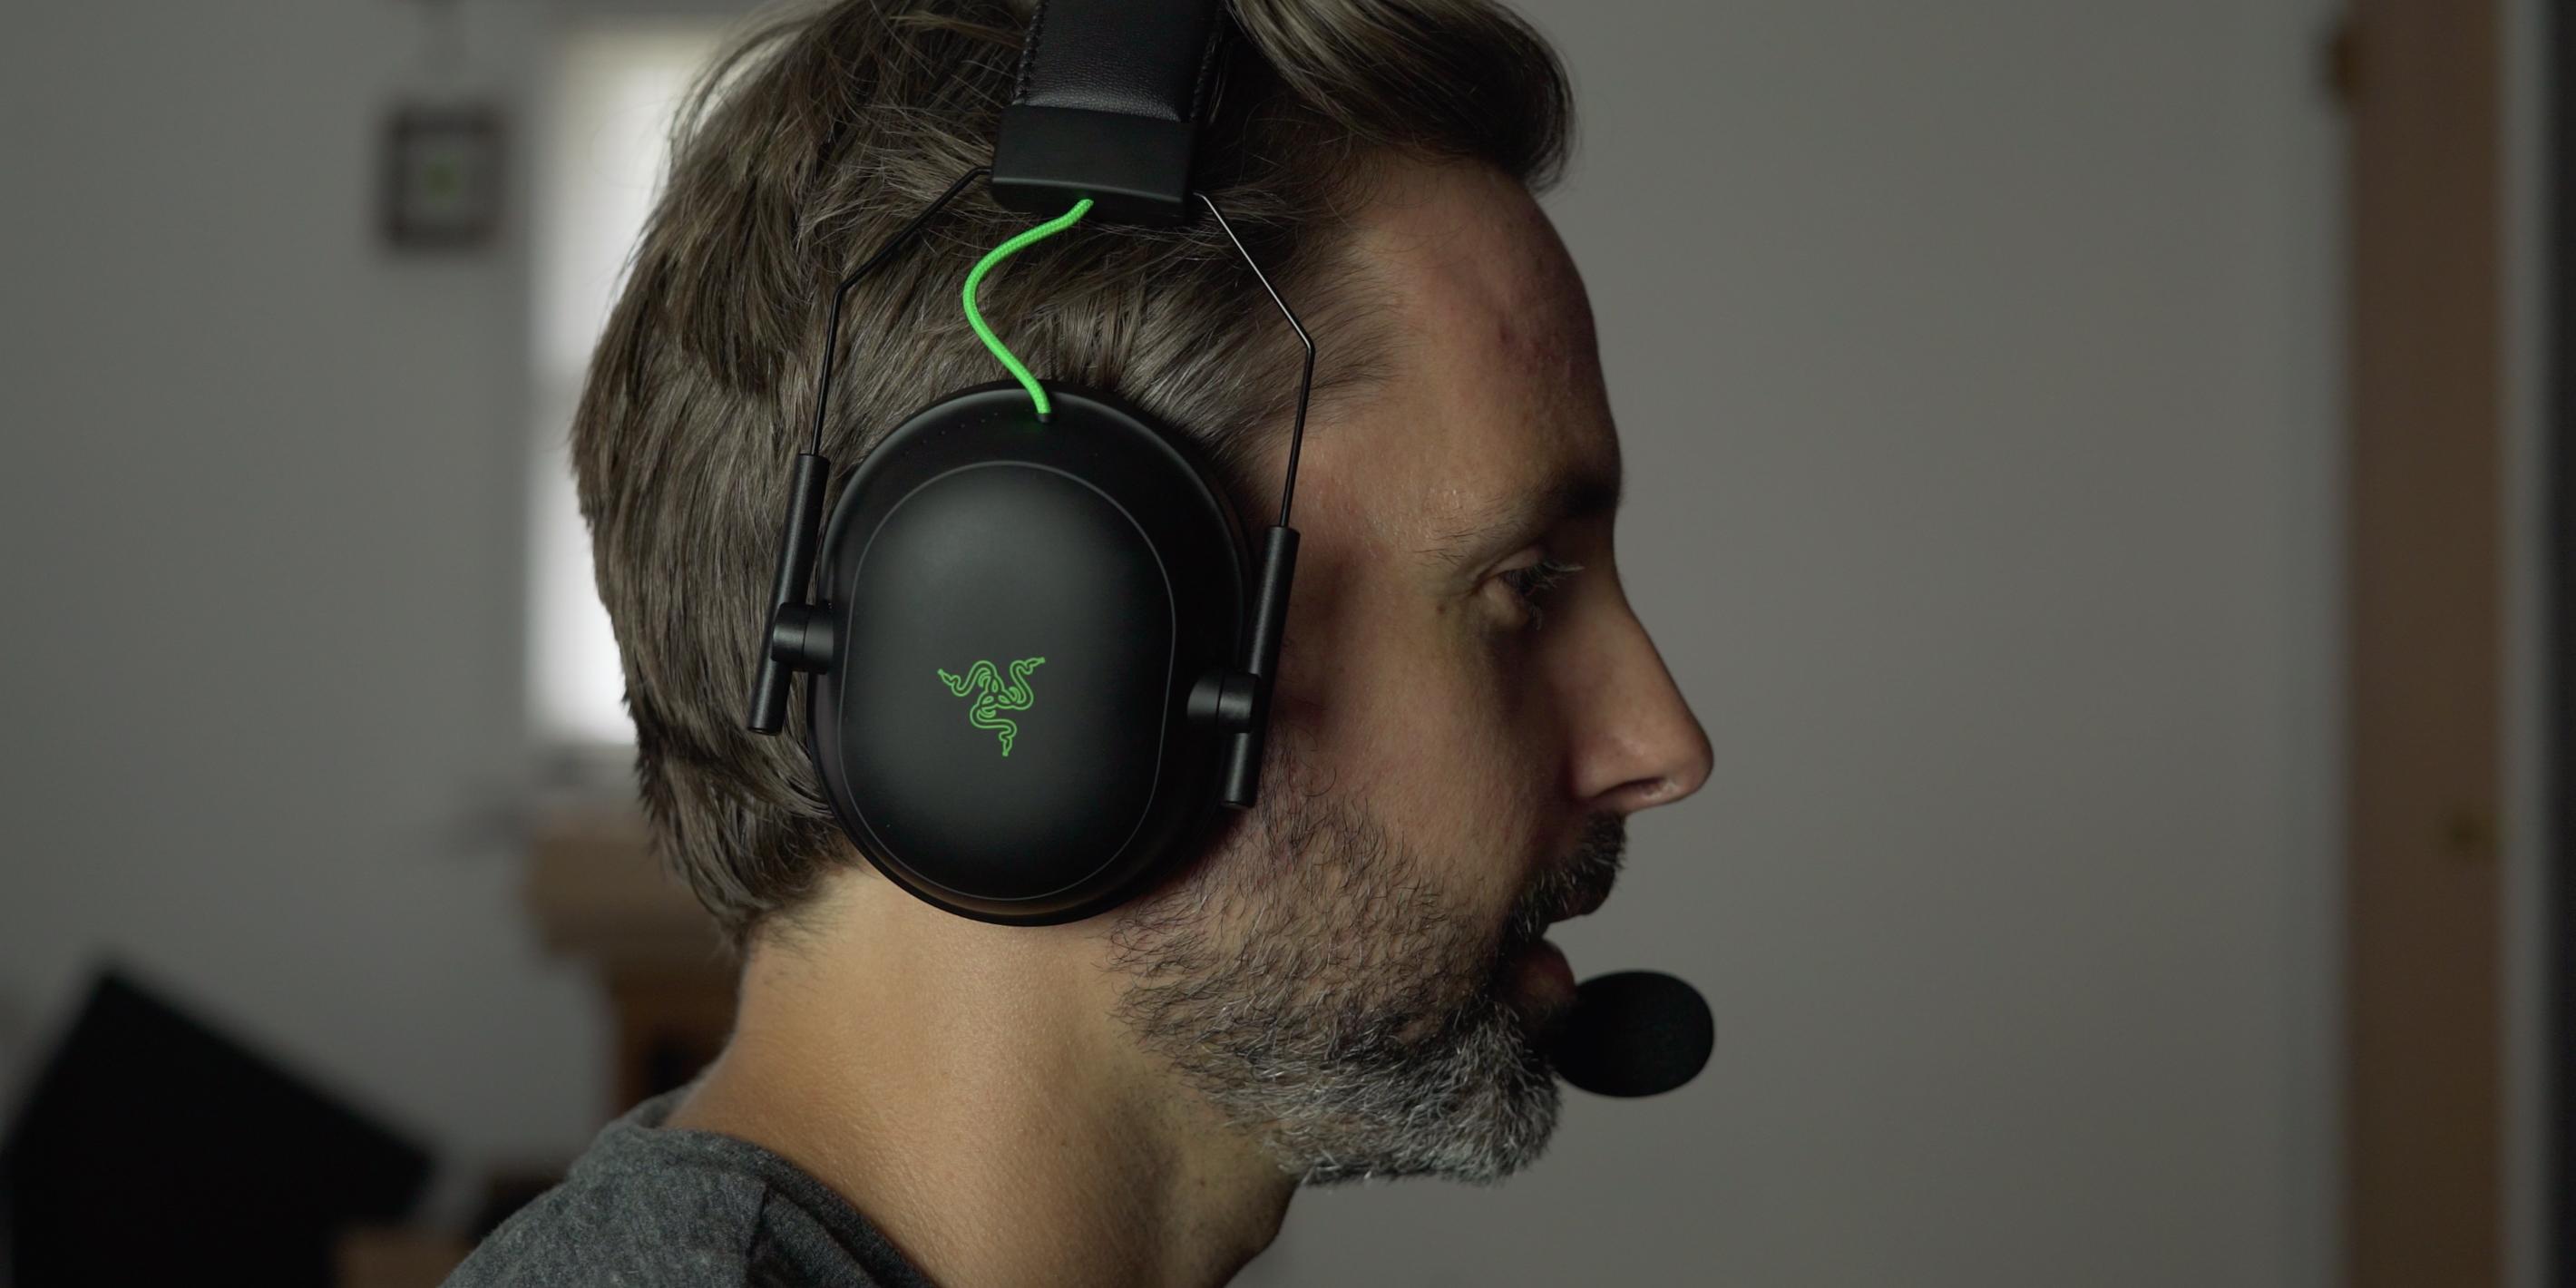 Listening to the Razer BlackShark V2 headset